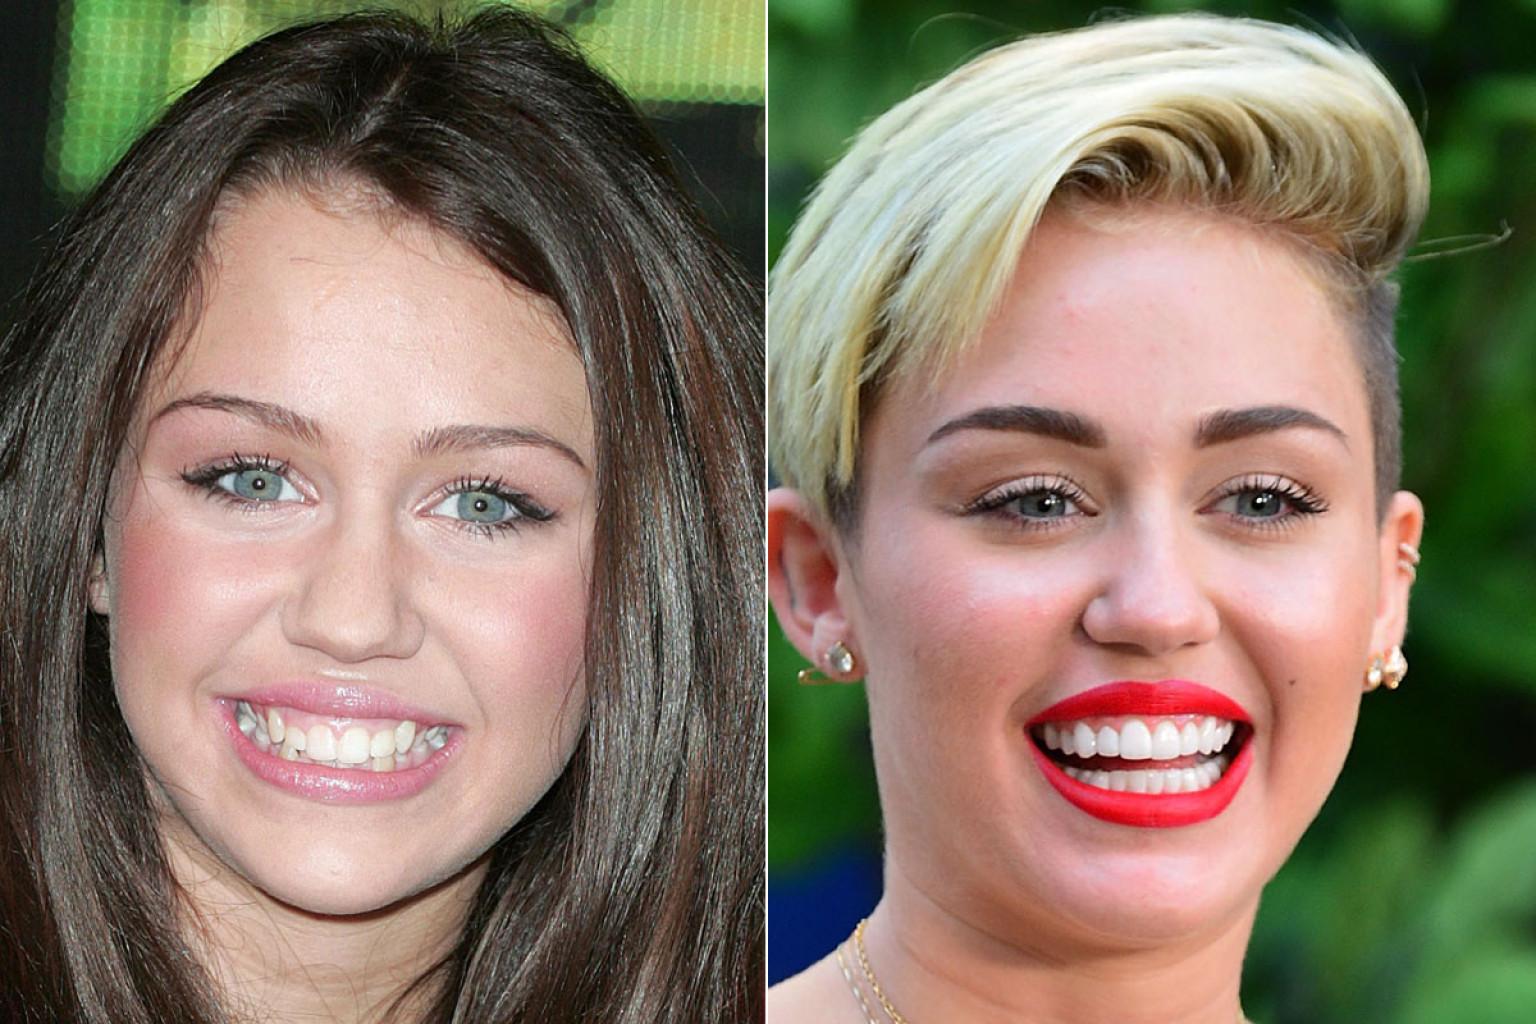 Miley Cyrus with False Teeth